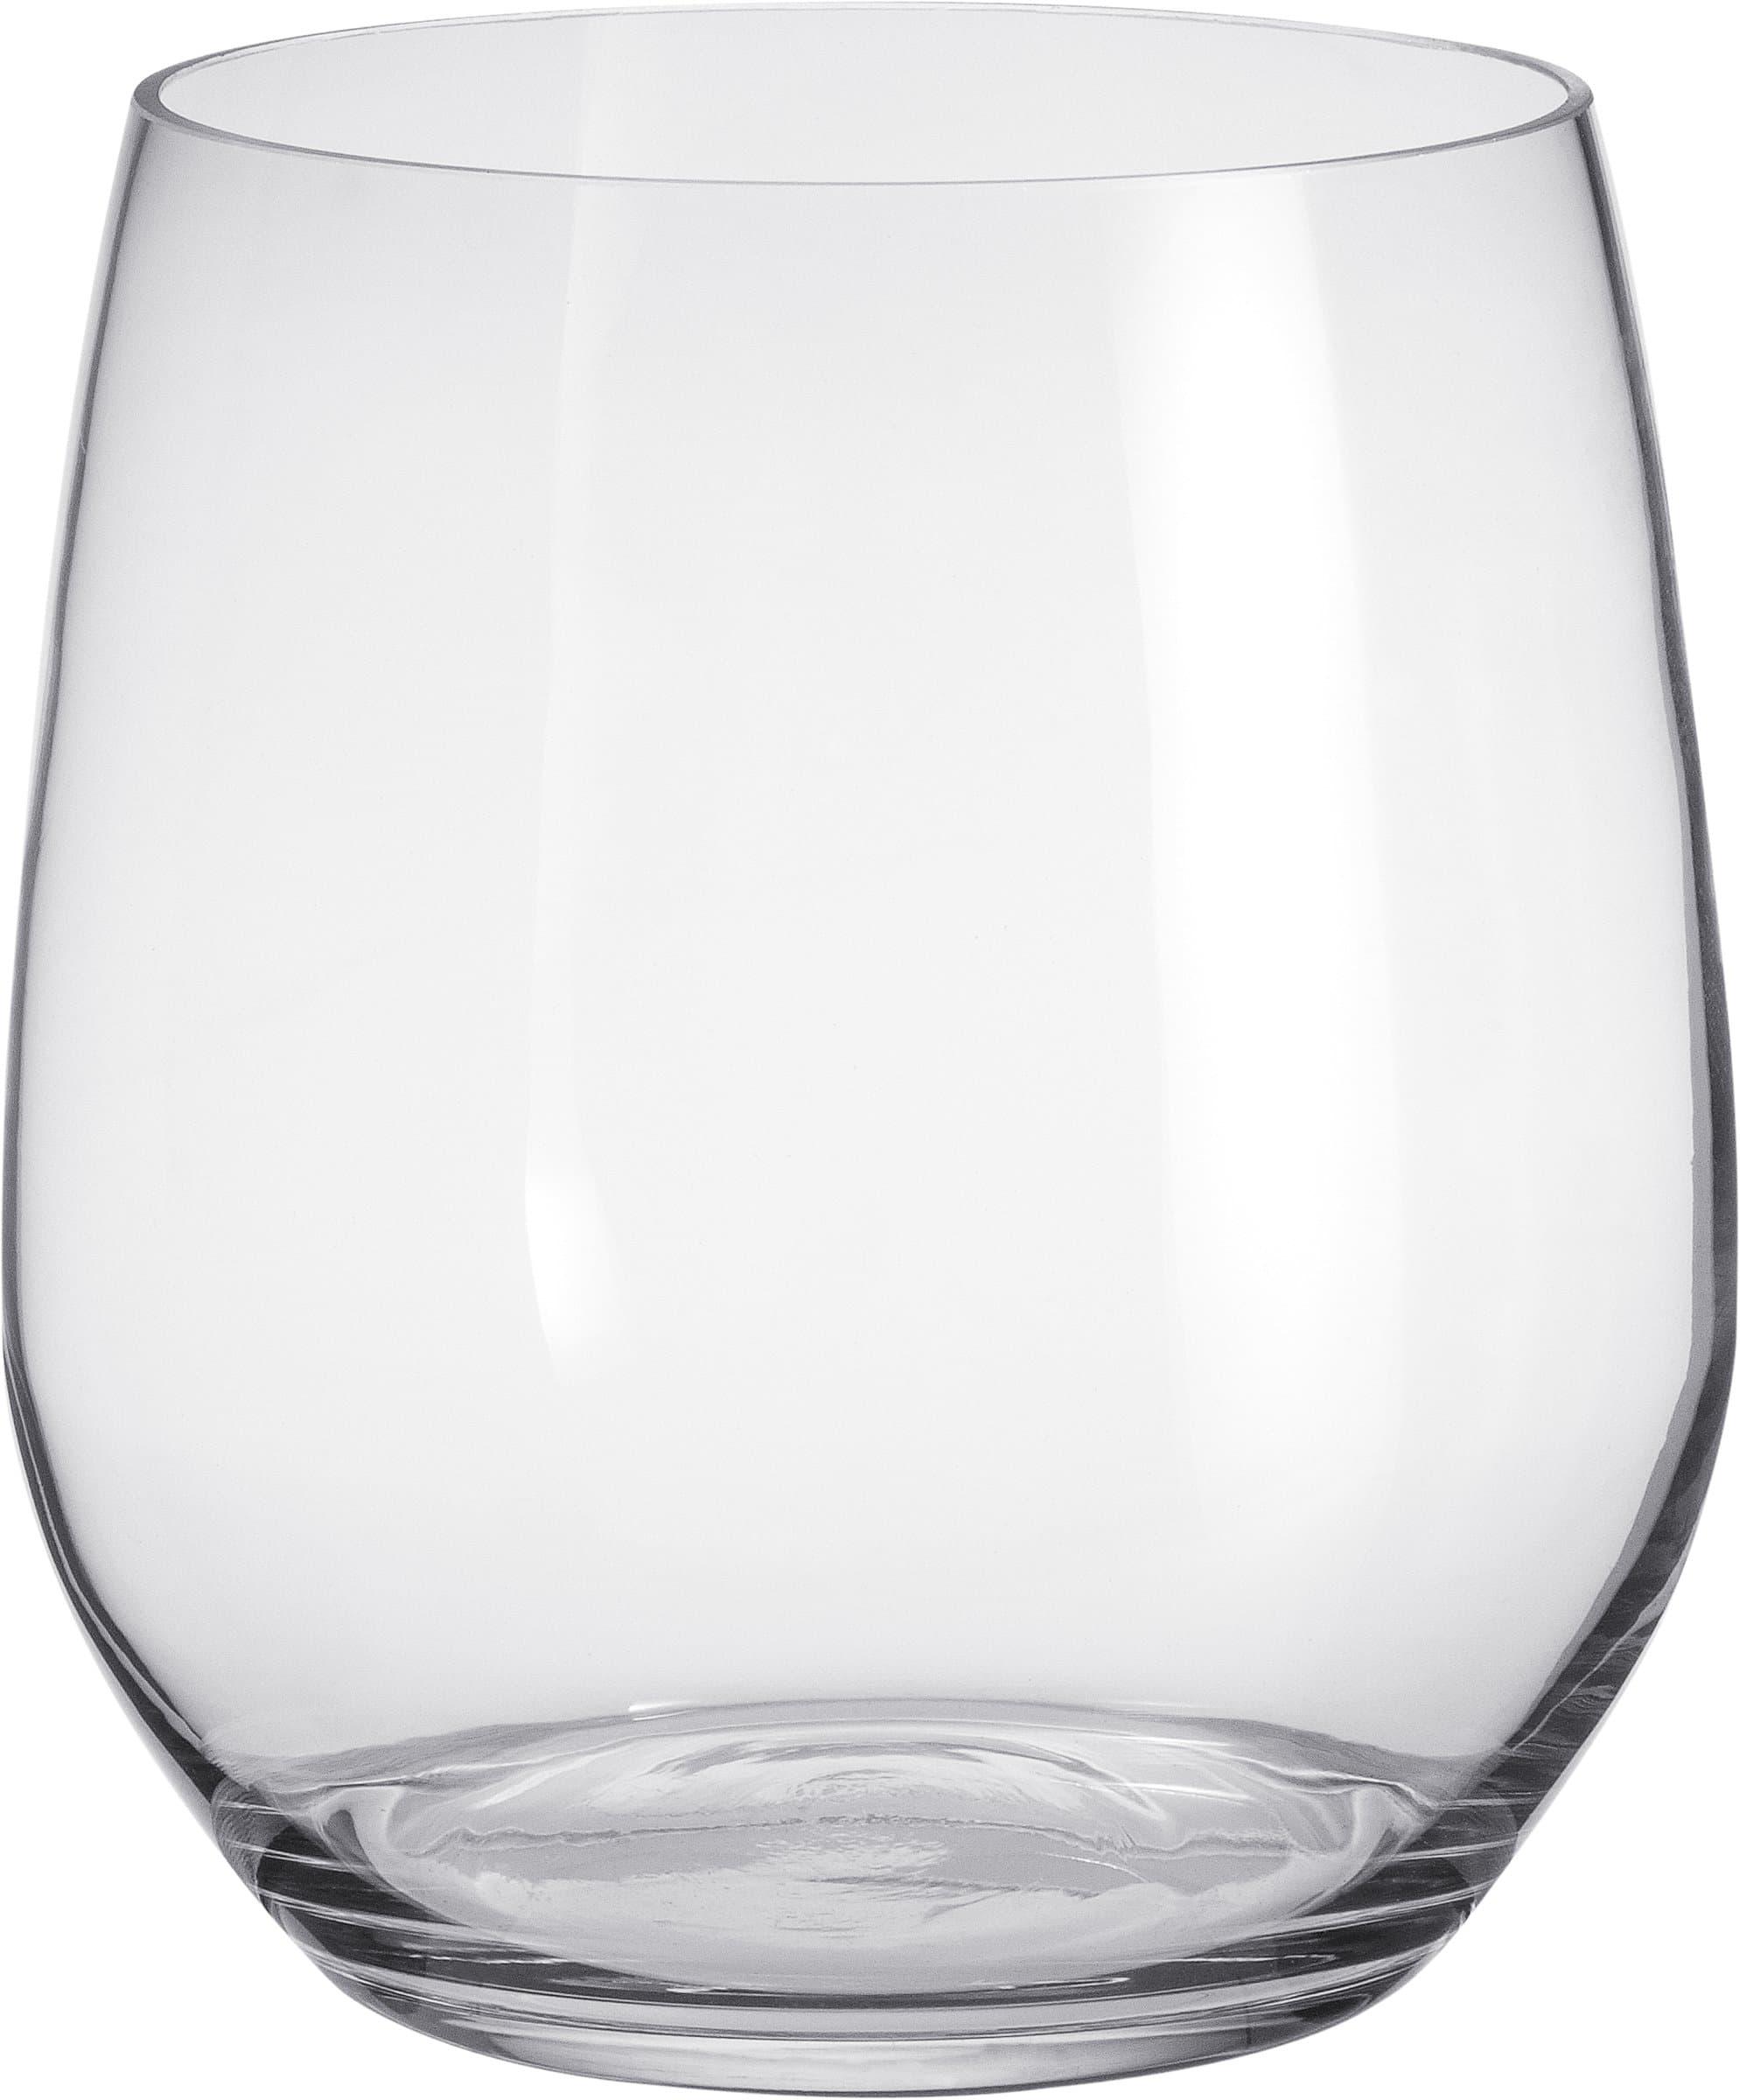 Hakbjl Glass Vase Tony